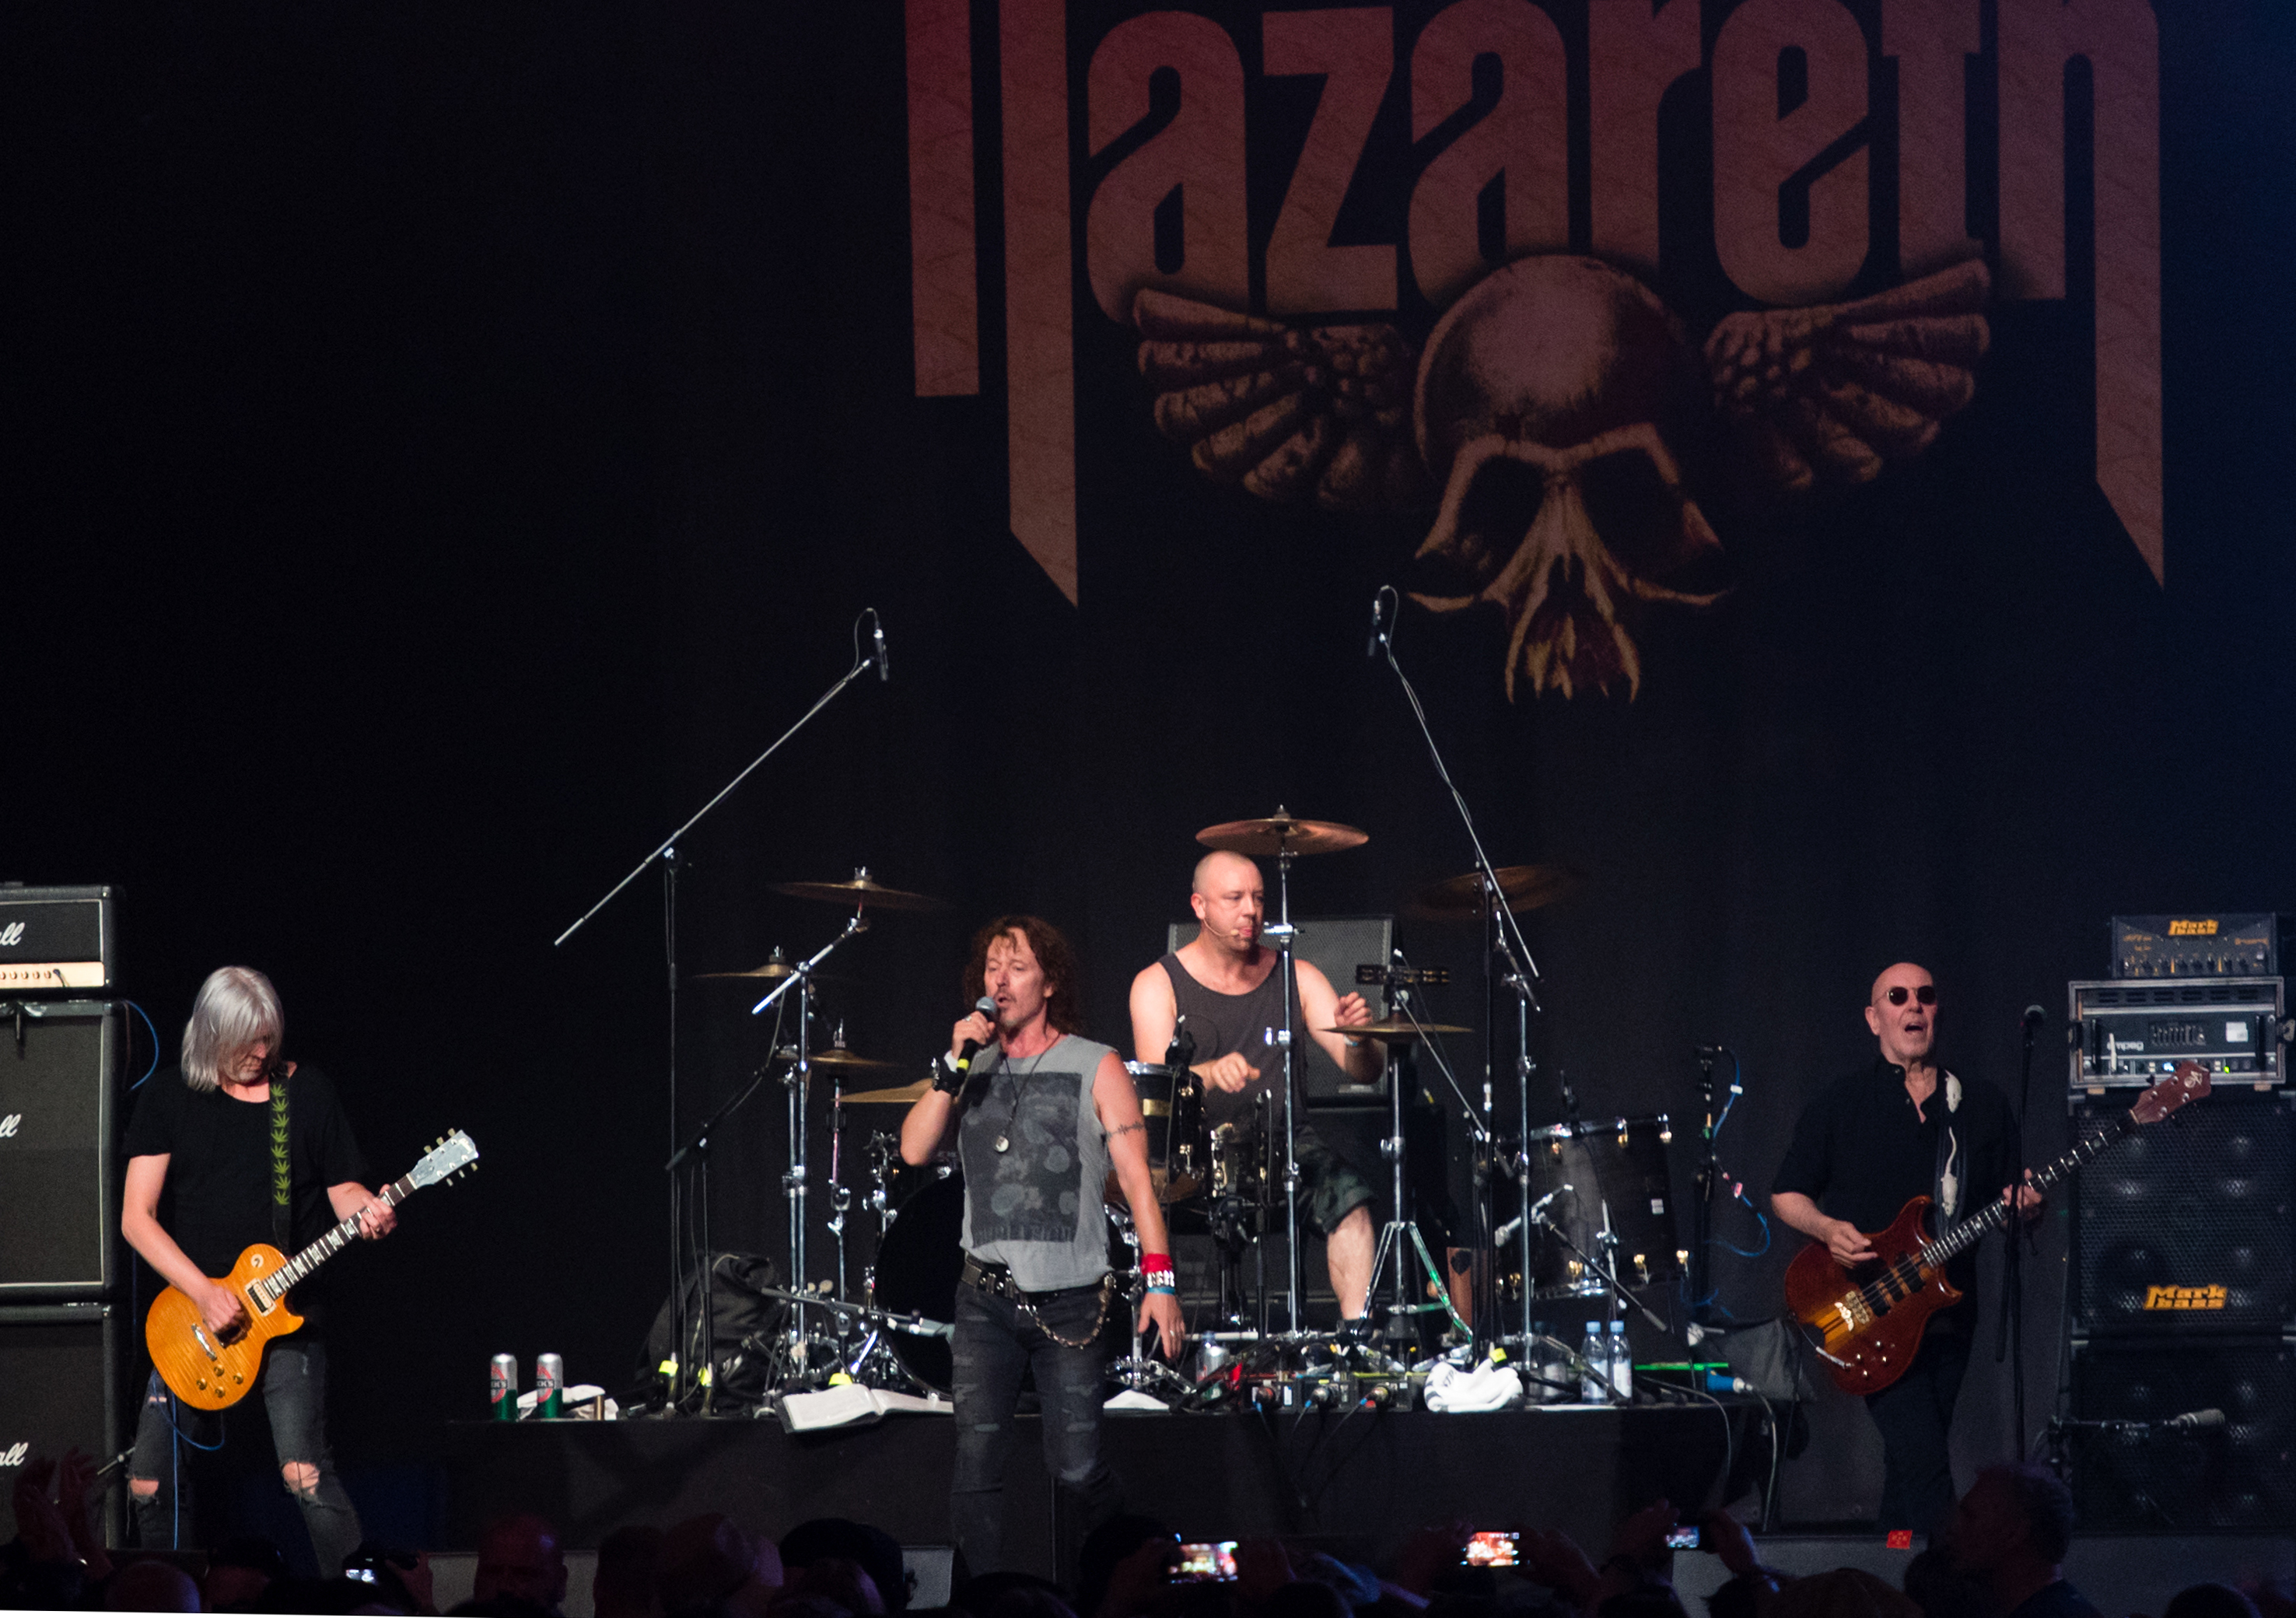 Nazareth (band) - Wikipedia